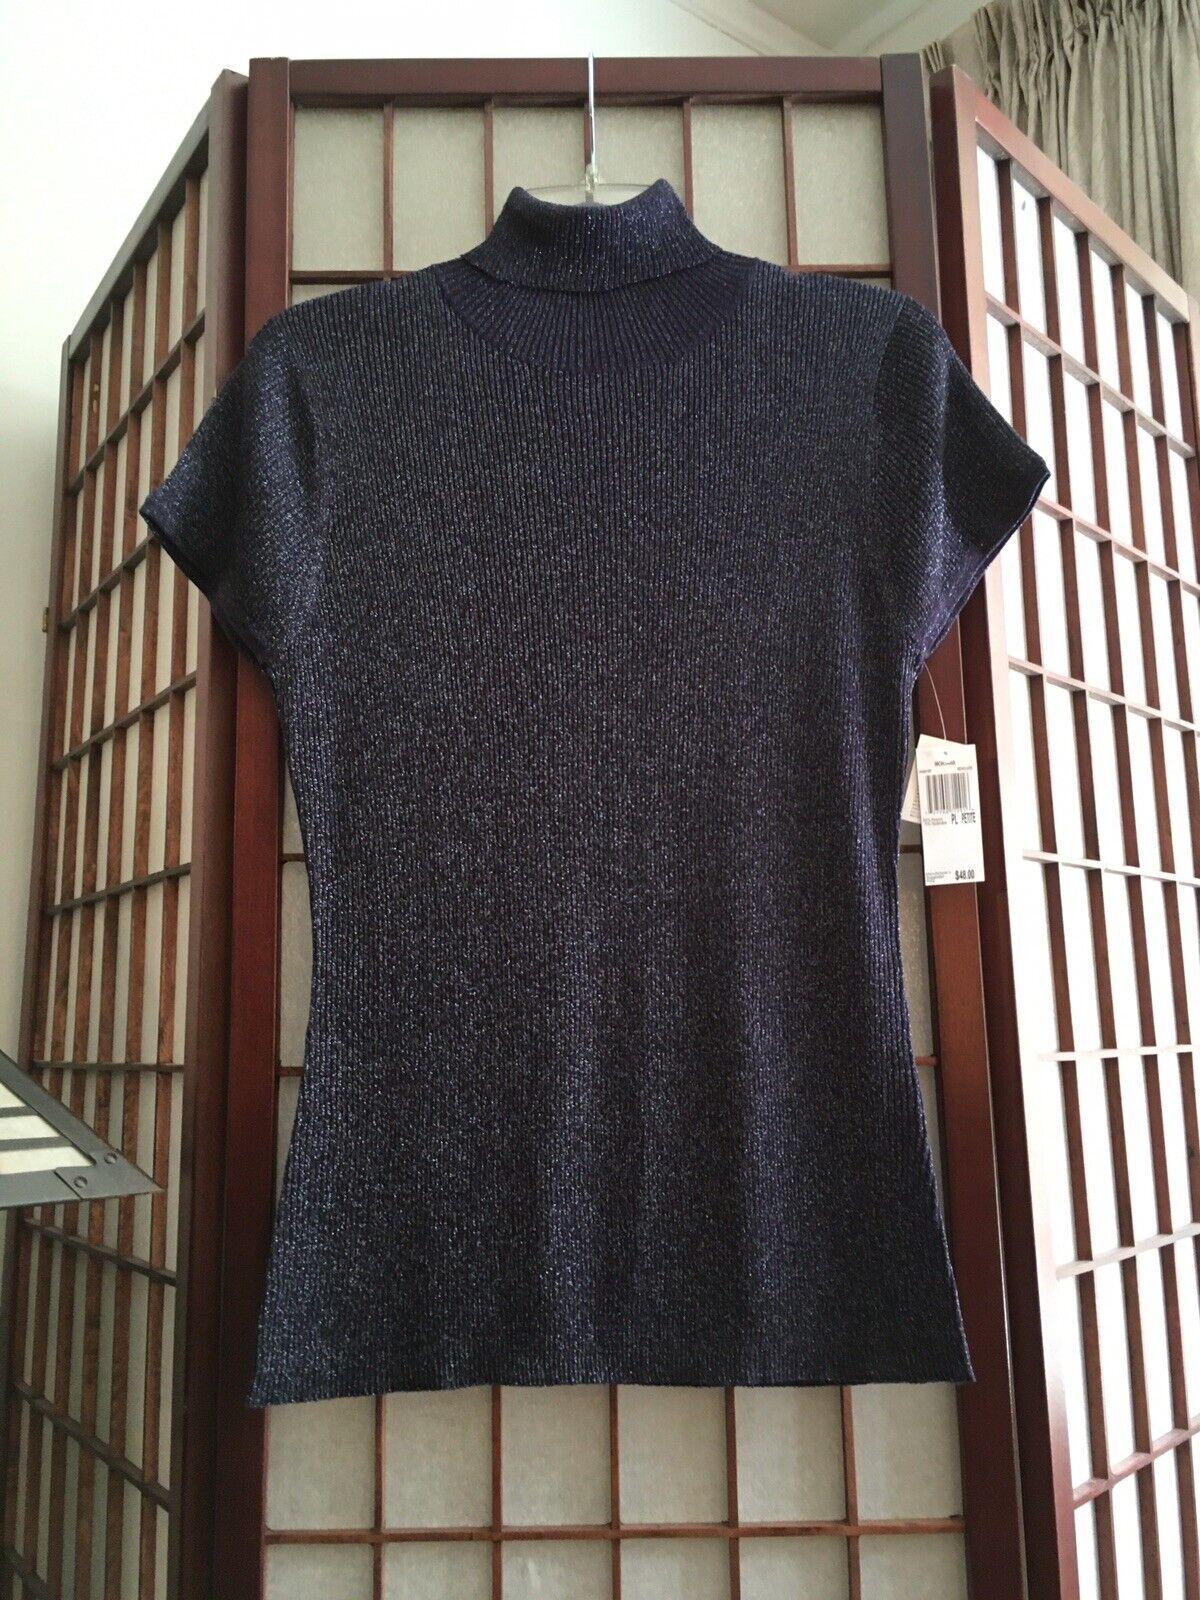 NWT AUGUST SILK Cocktail Turtleneck Knit Top Size PL Purple Navy Metallic